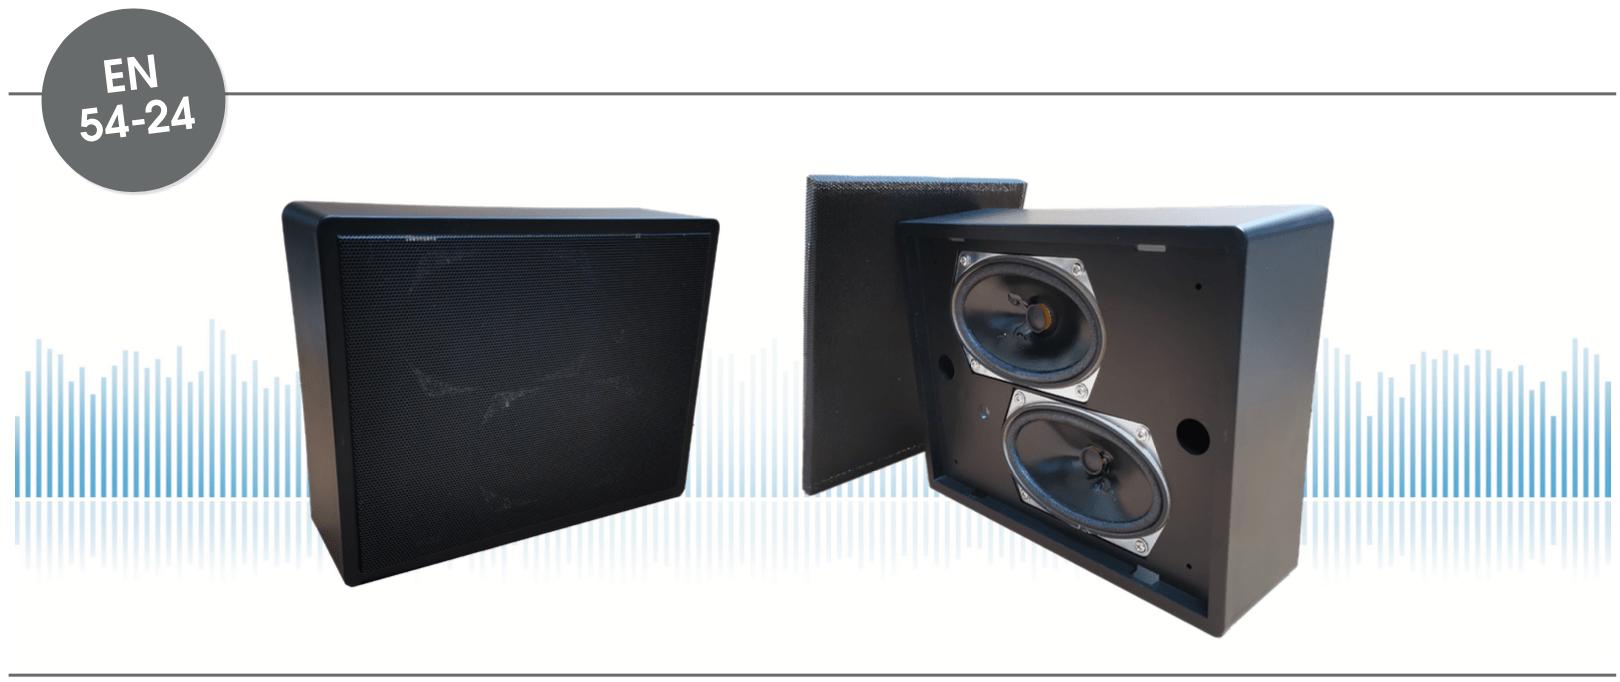 WLA-230-AB/EN5424 BLACK EDITION